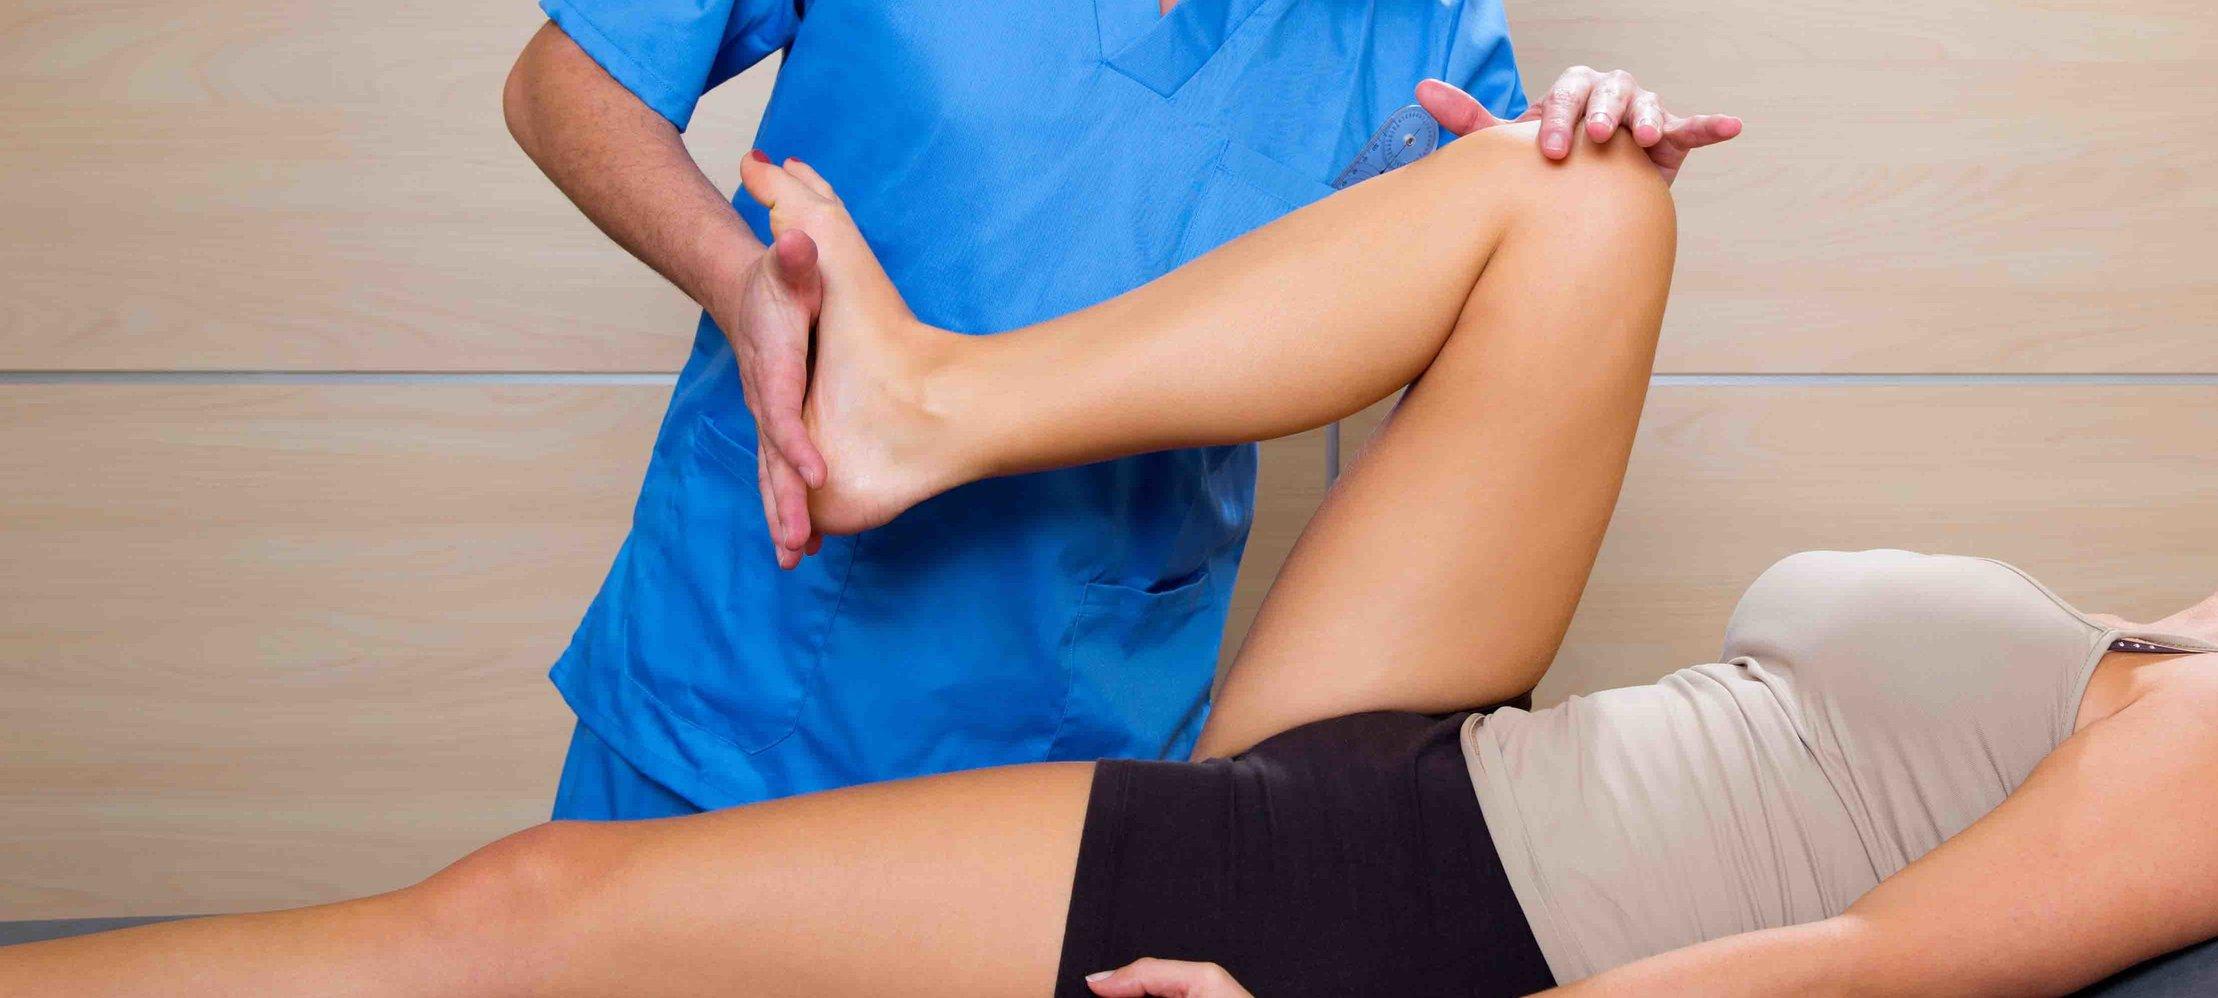 Carrusel-Fisioterapia